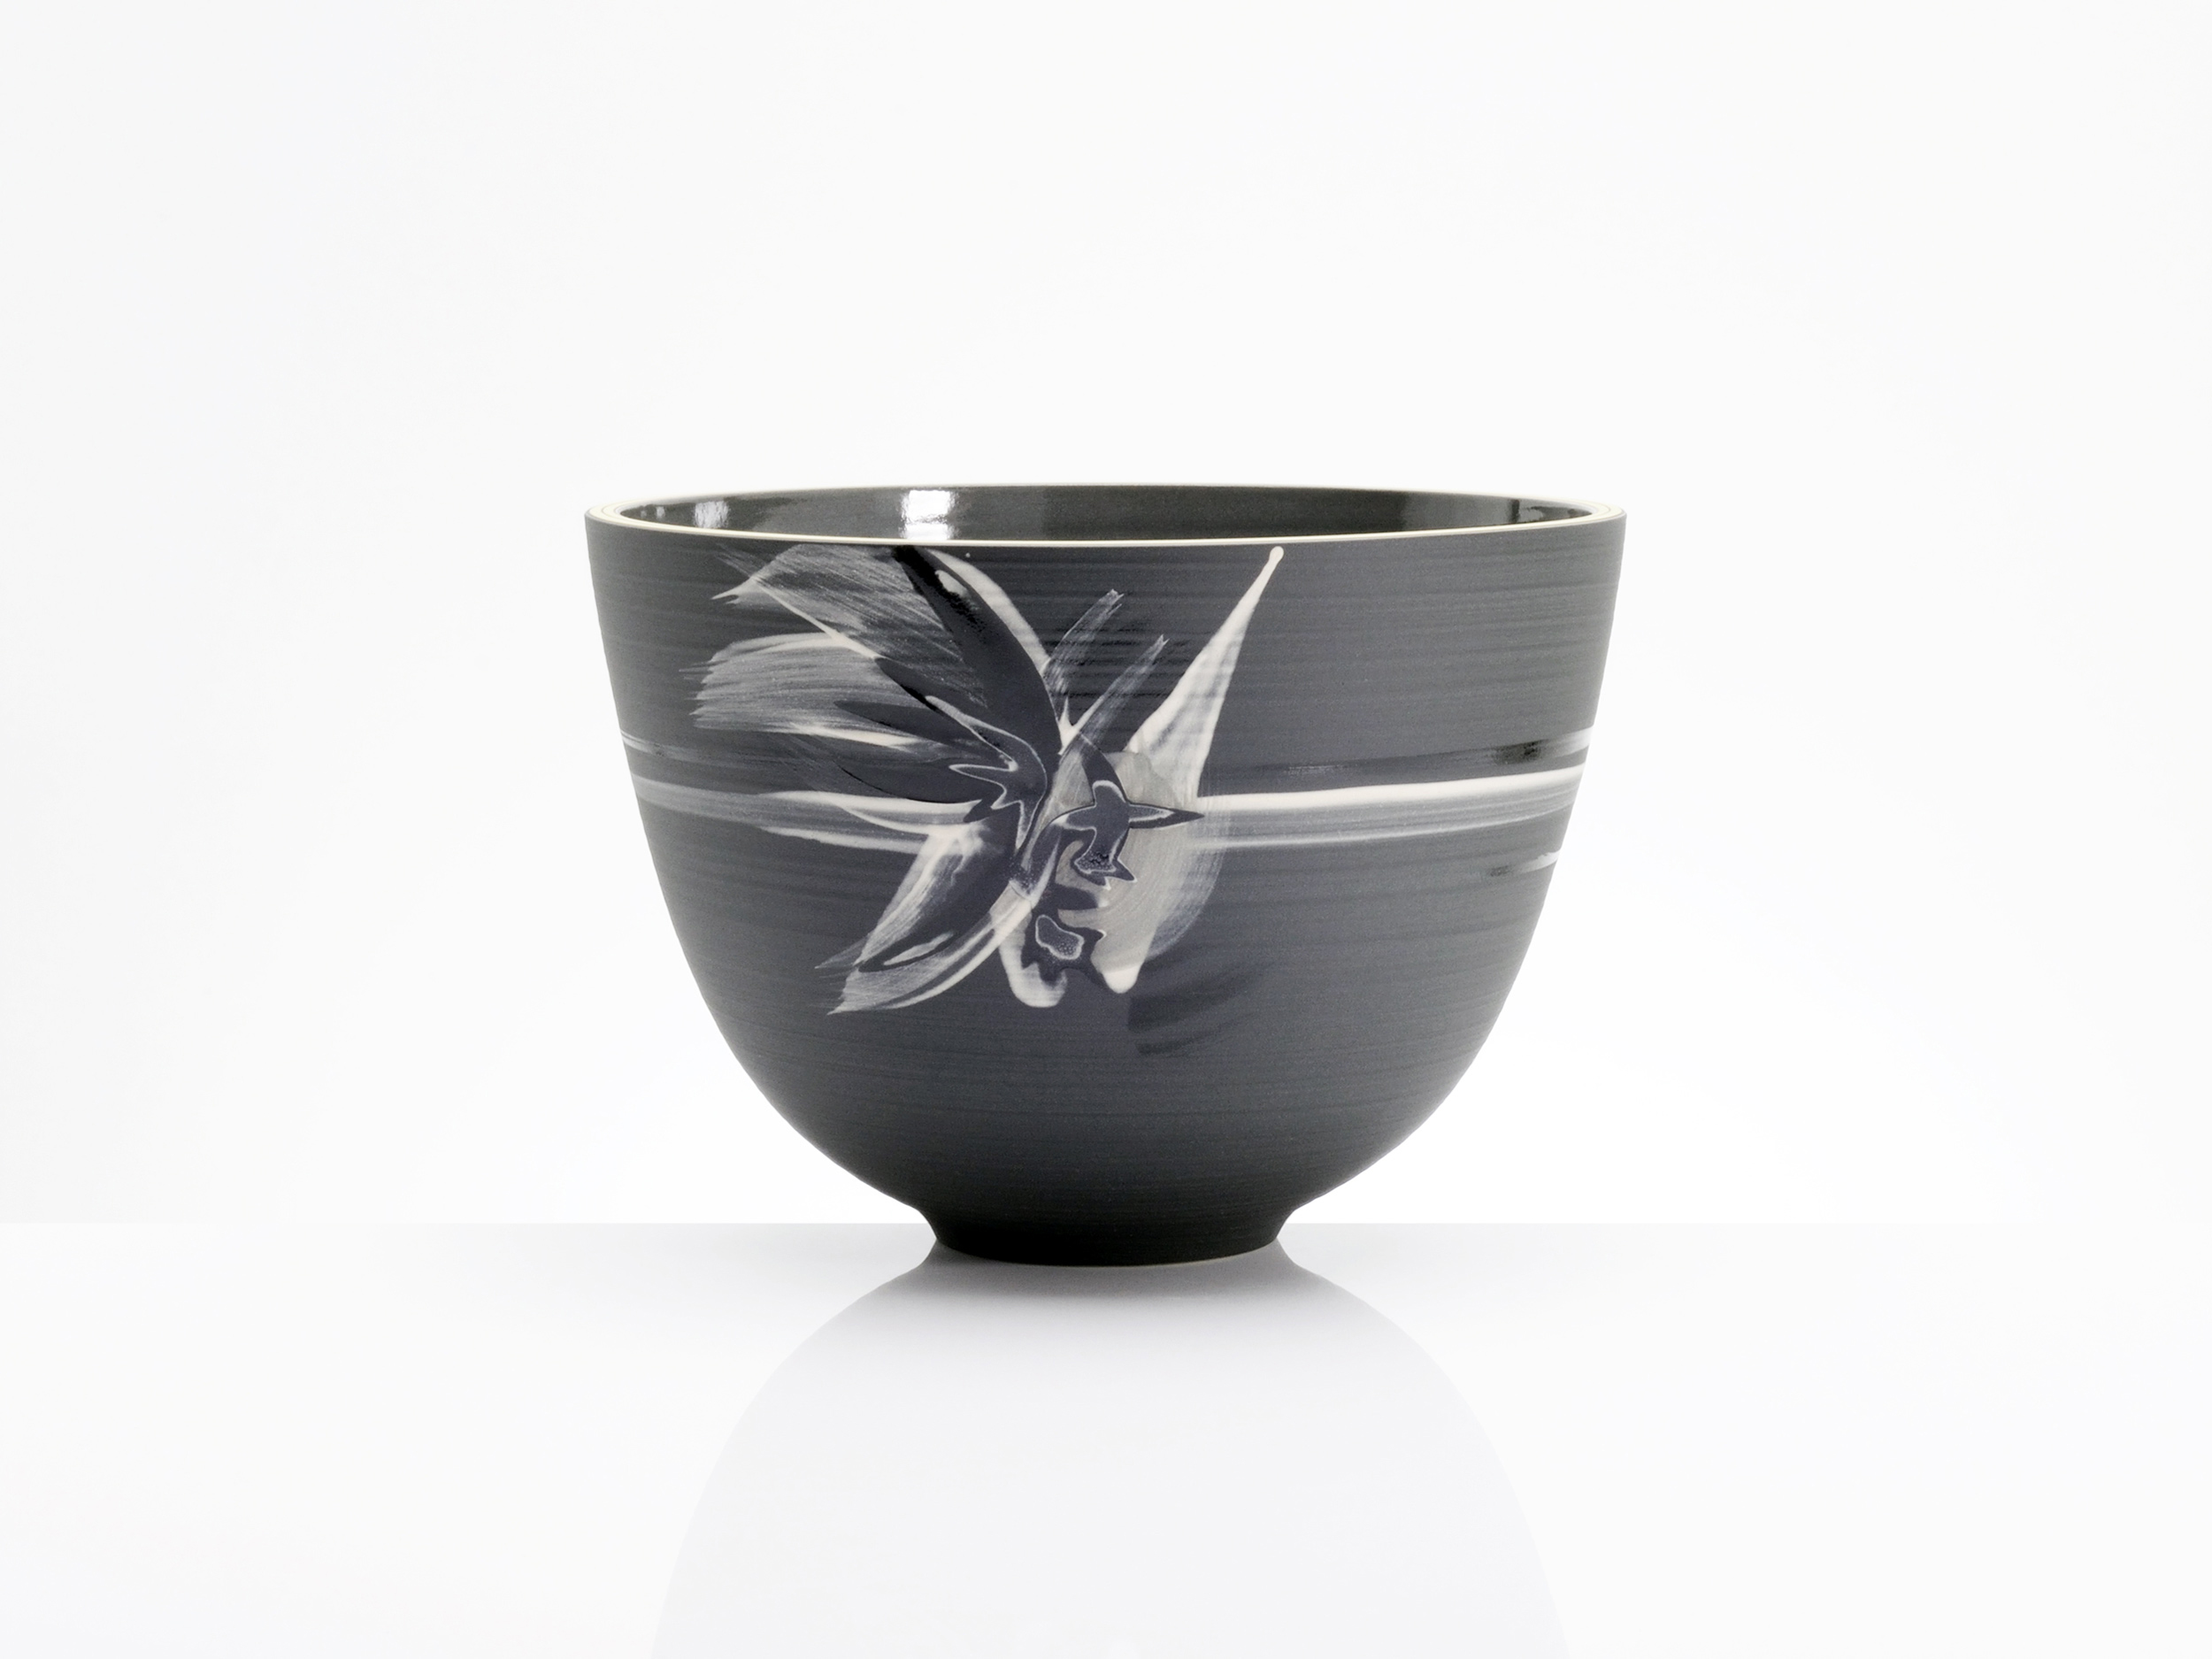 Star Wars Black Ceramic Bowl by Rowena Gilbert